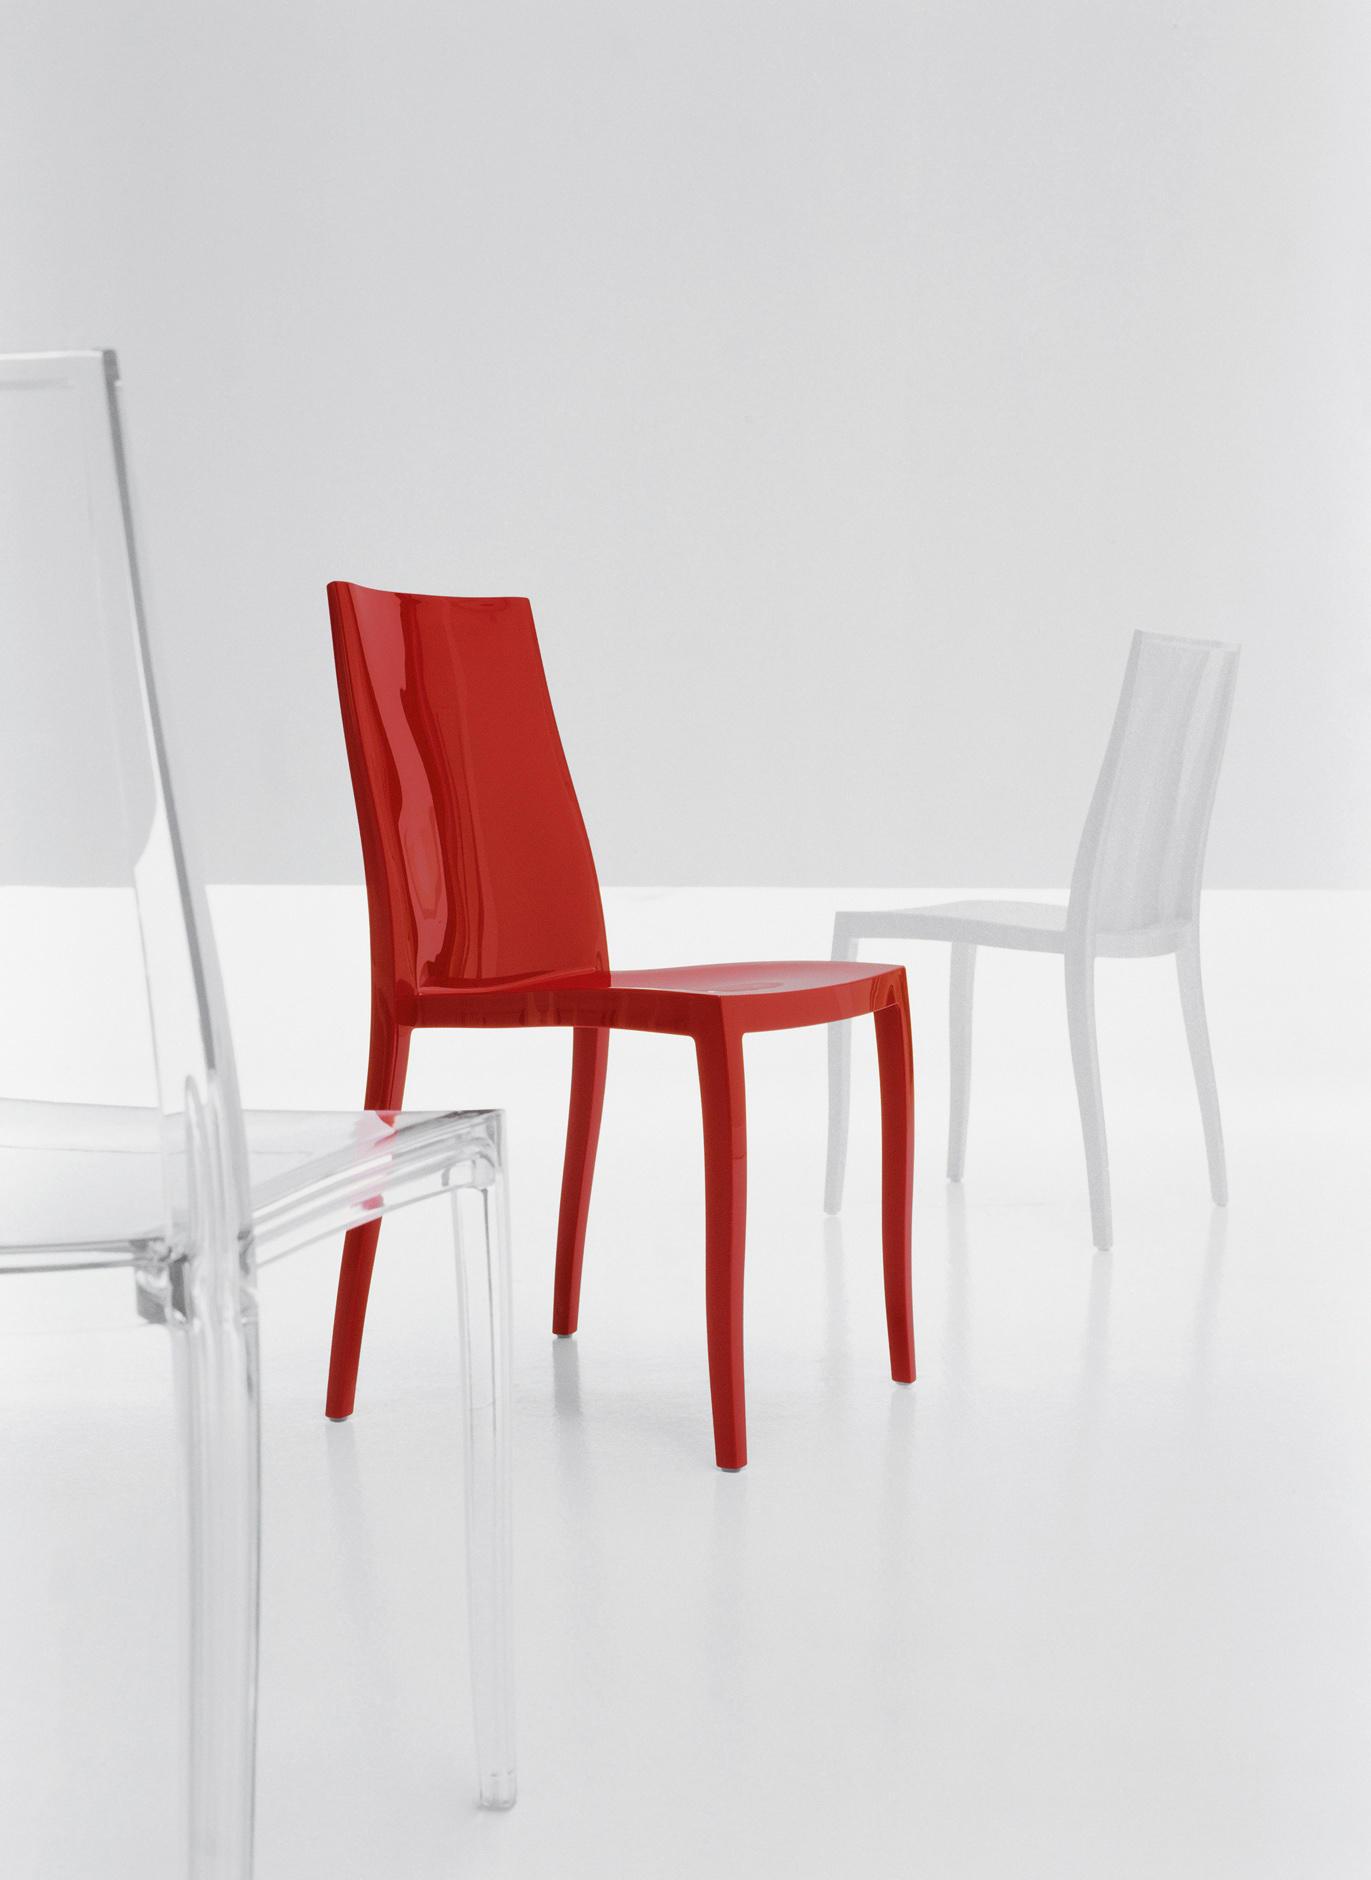 pangea  garden chairs from bonaldo  architonic - pangea by bonaldo  garden chairs · pangea by bonaldo  garden chairs